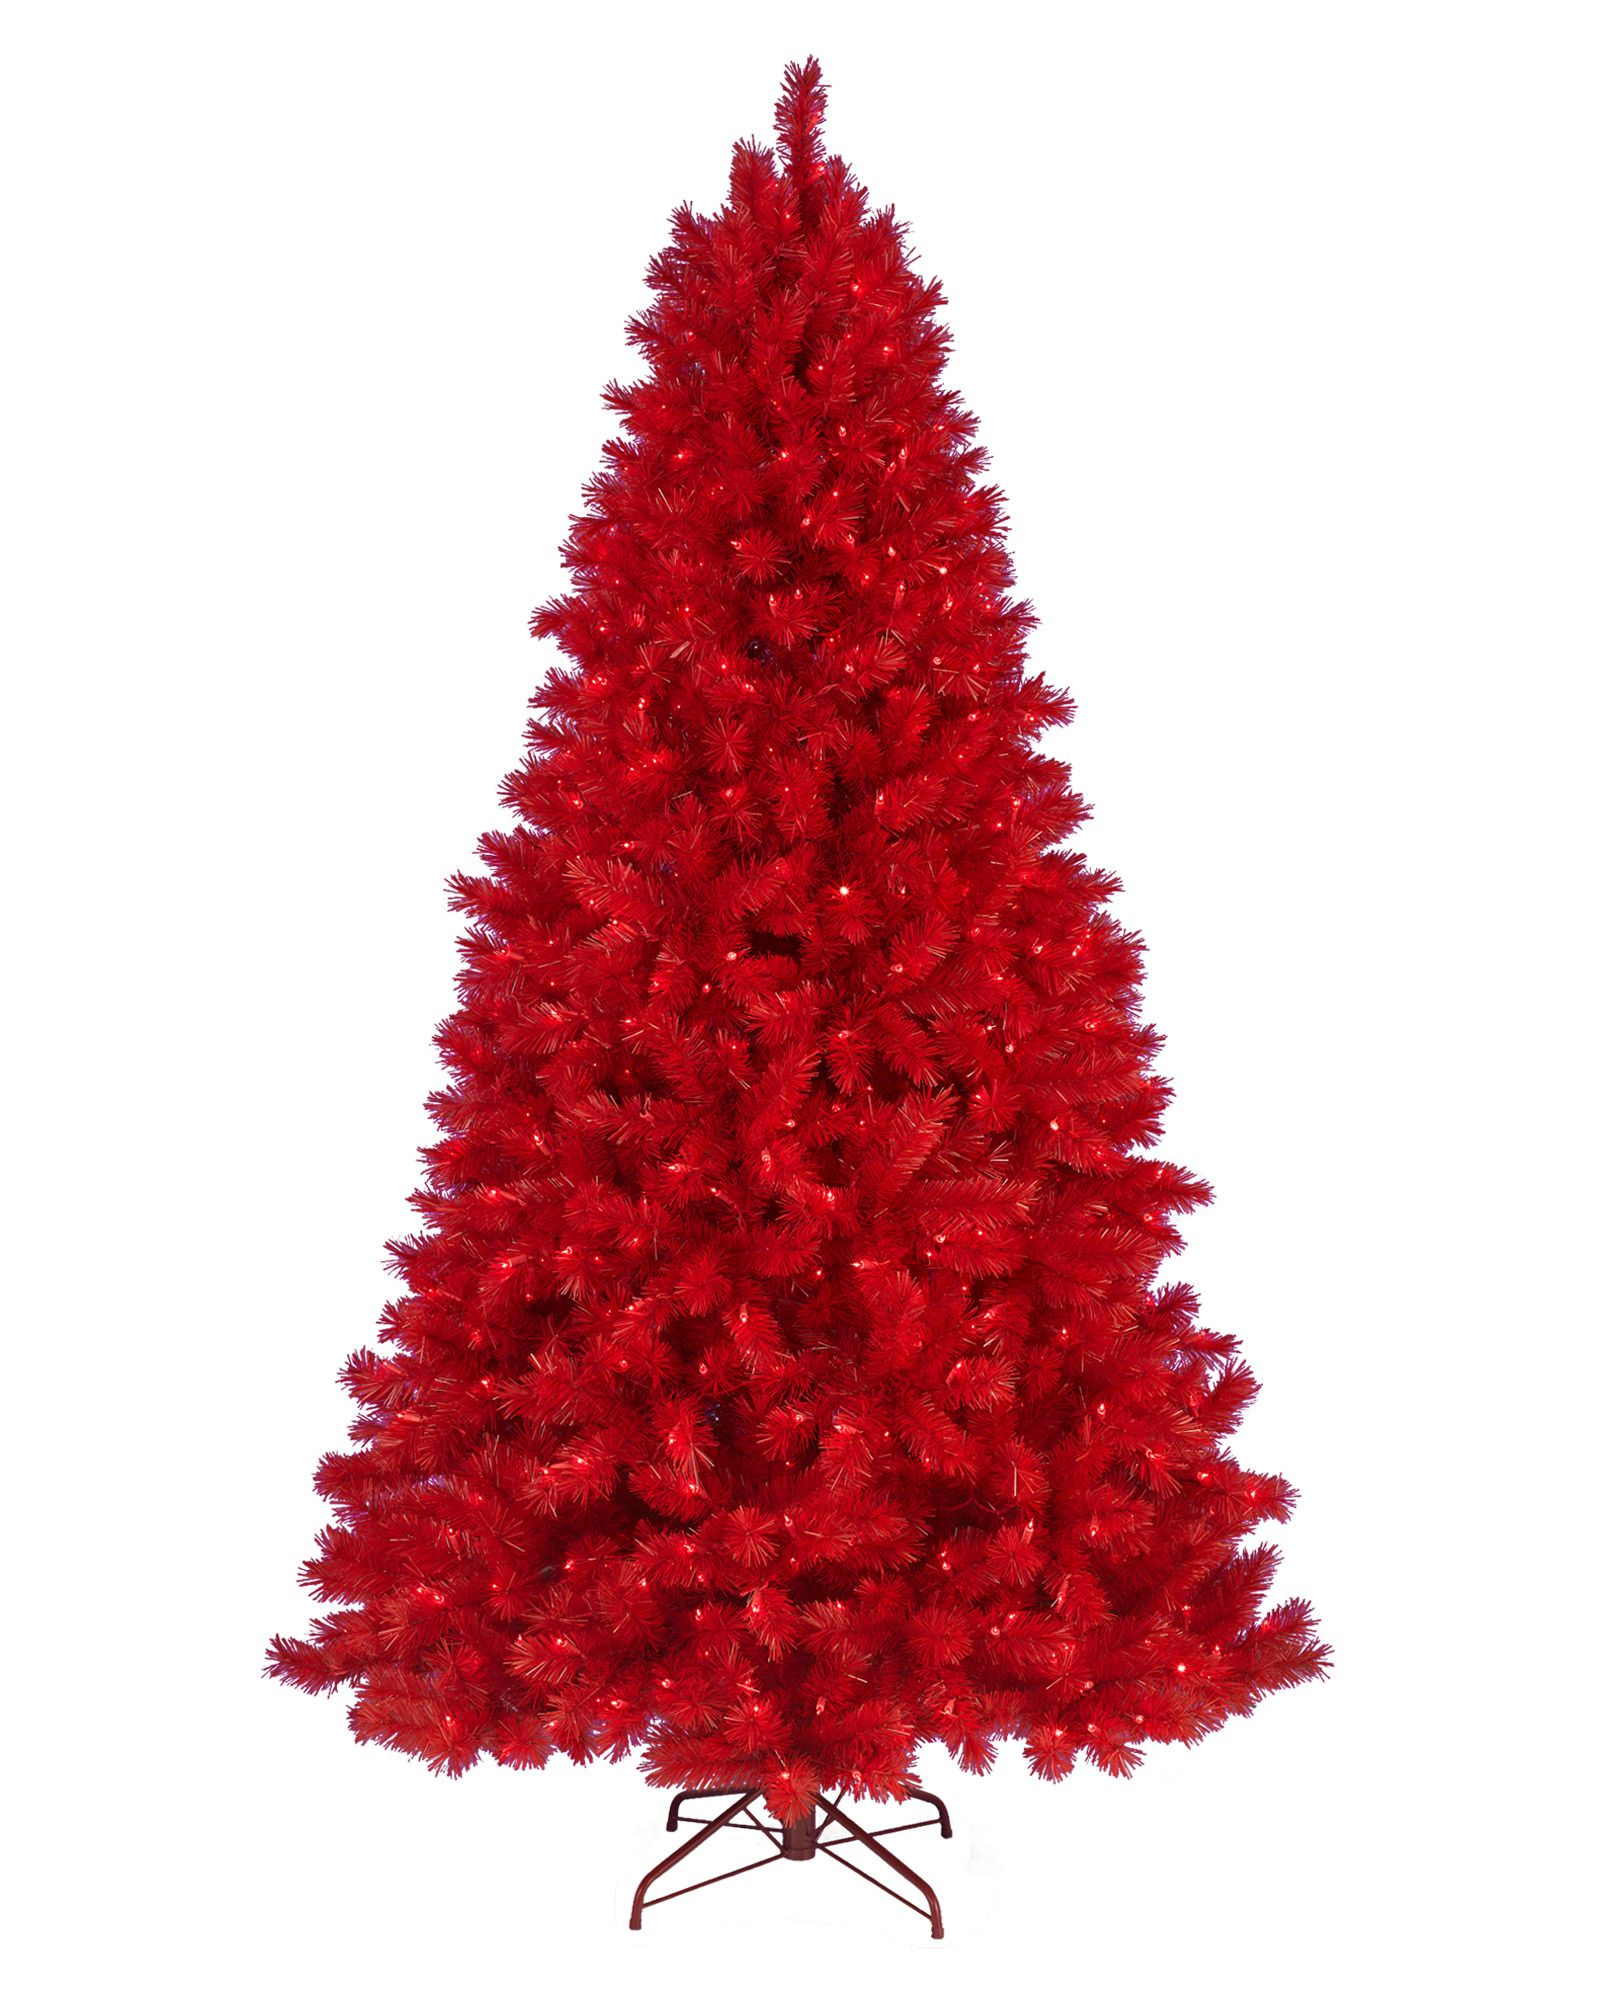 Lipstick Red Christmas Tree Red Christmas Tree Artificial Christmas Tree Colorful Christmas Tree